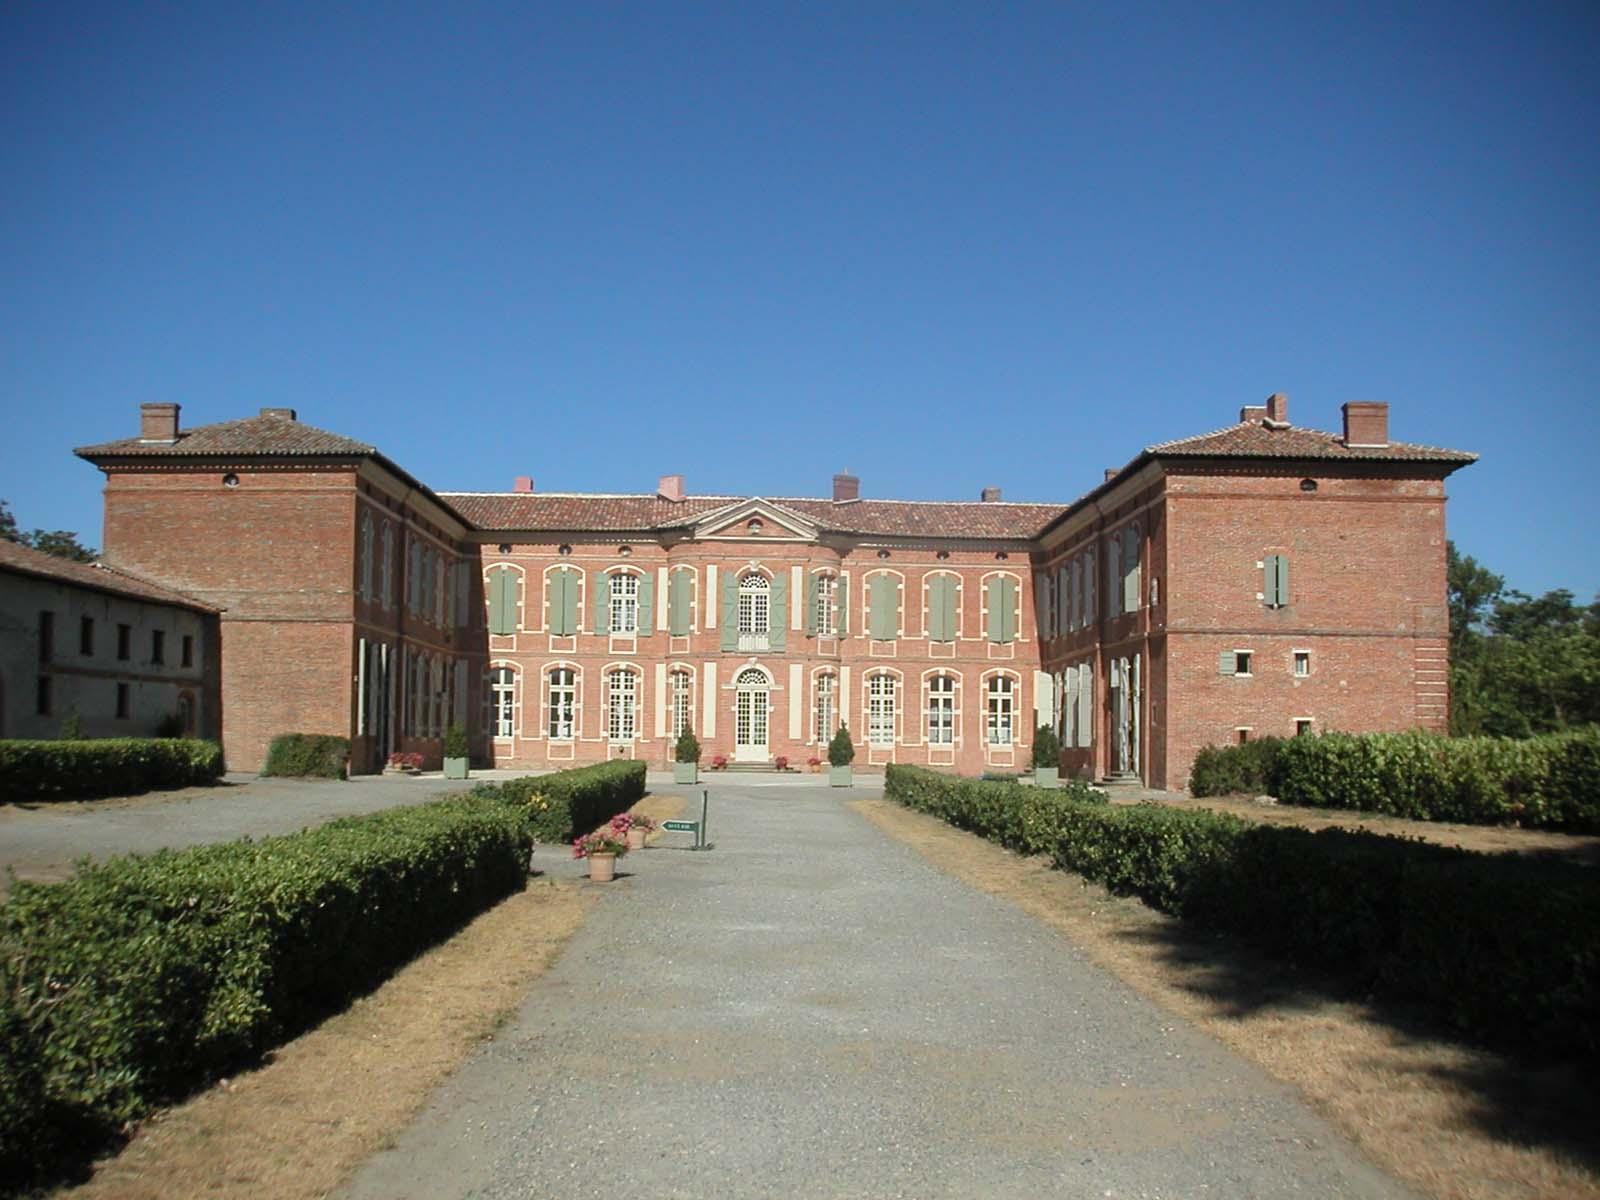 Merville (Haute-Garonne) France  city photos : France Toulouse Merville castle Wikimedia Commons